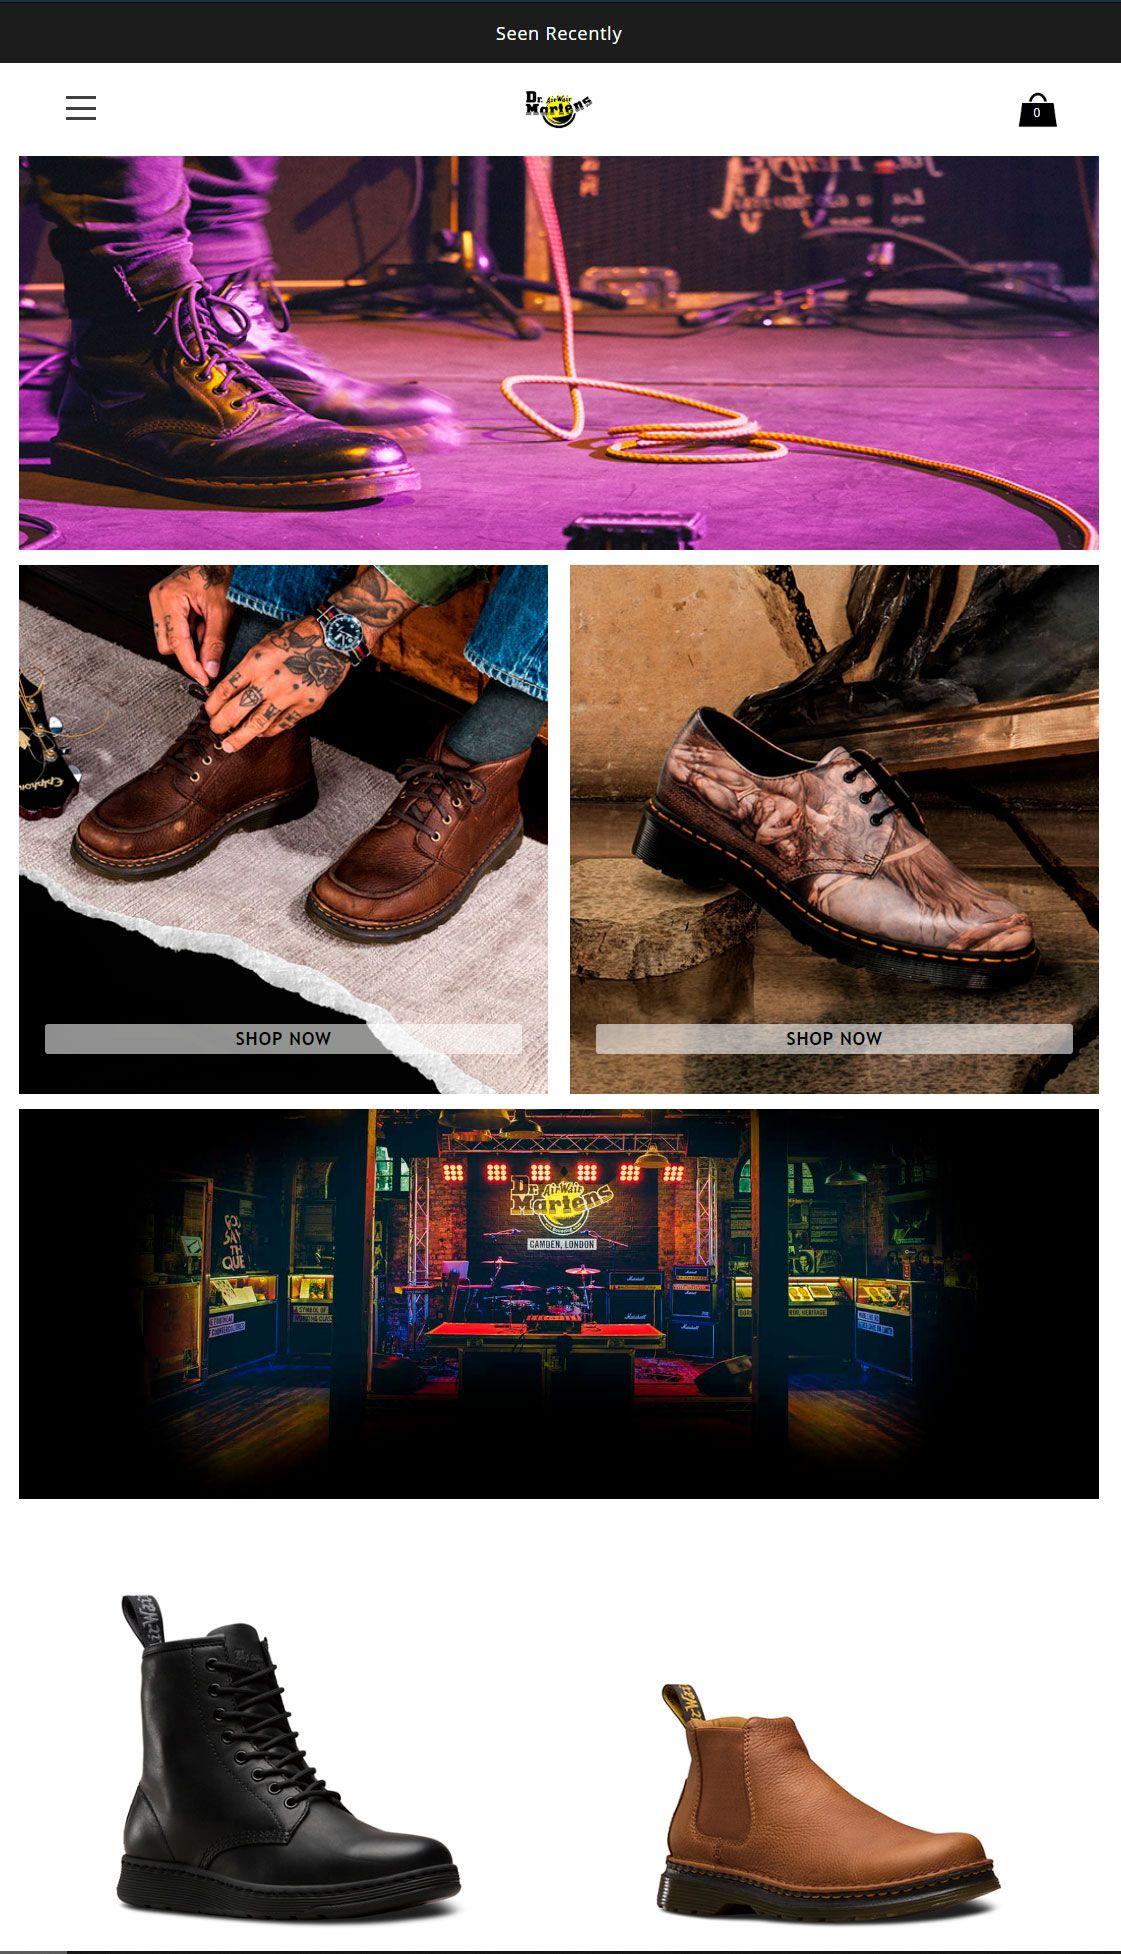 Shoesstorel.club Tienda Online Falsa Dr Martens